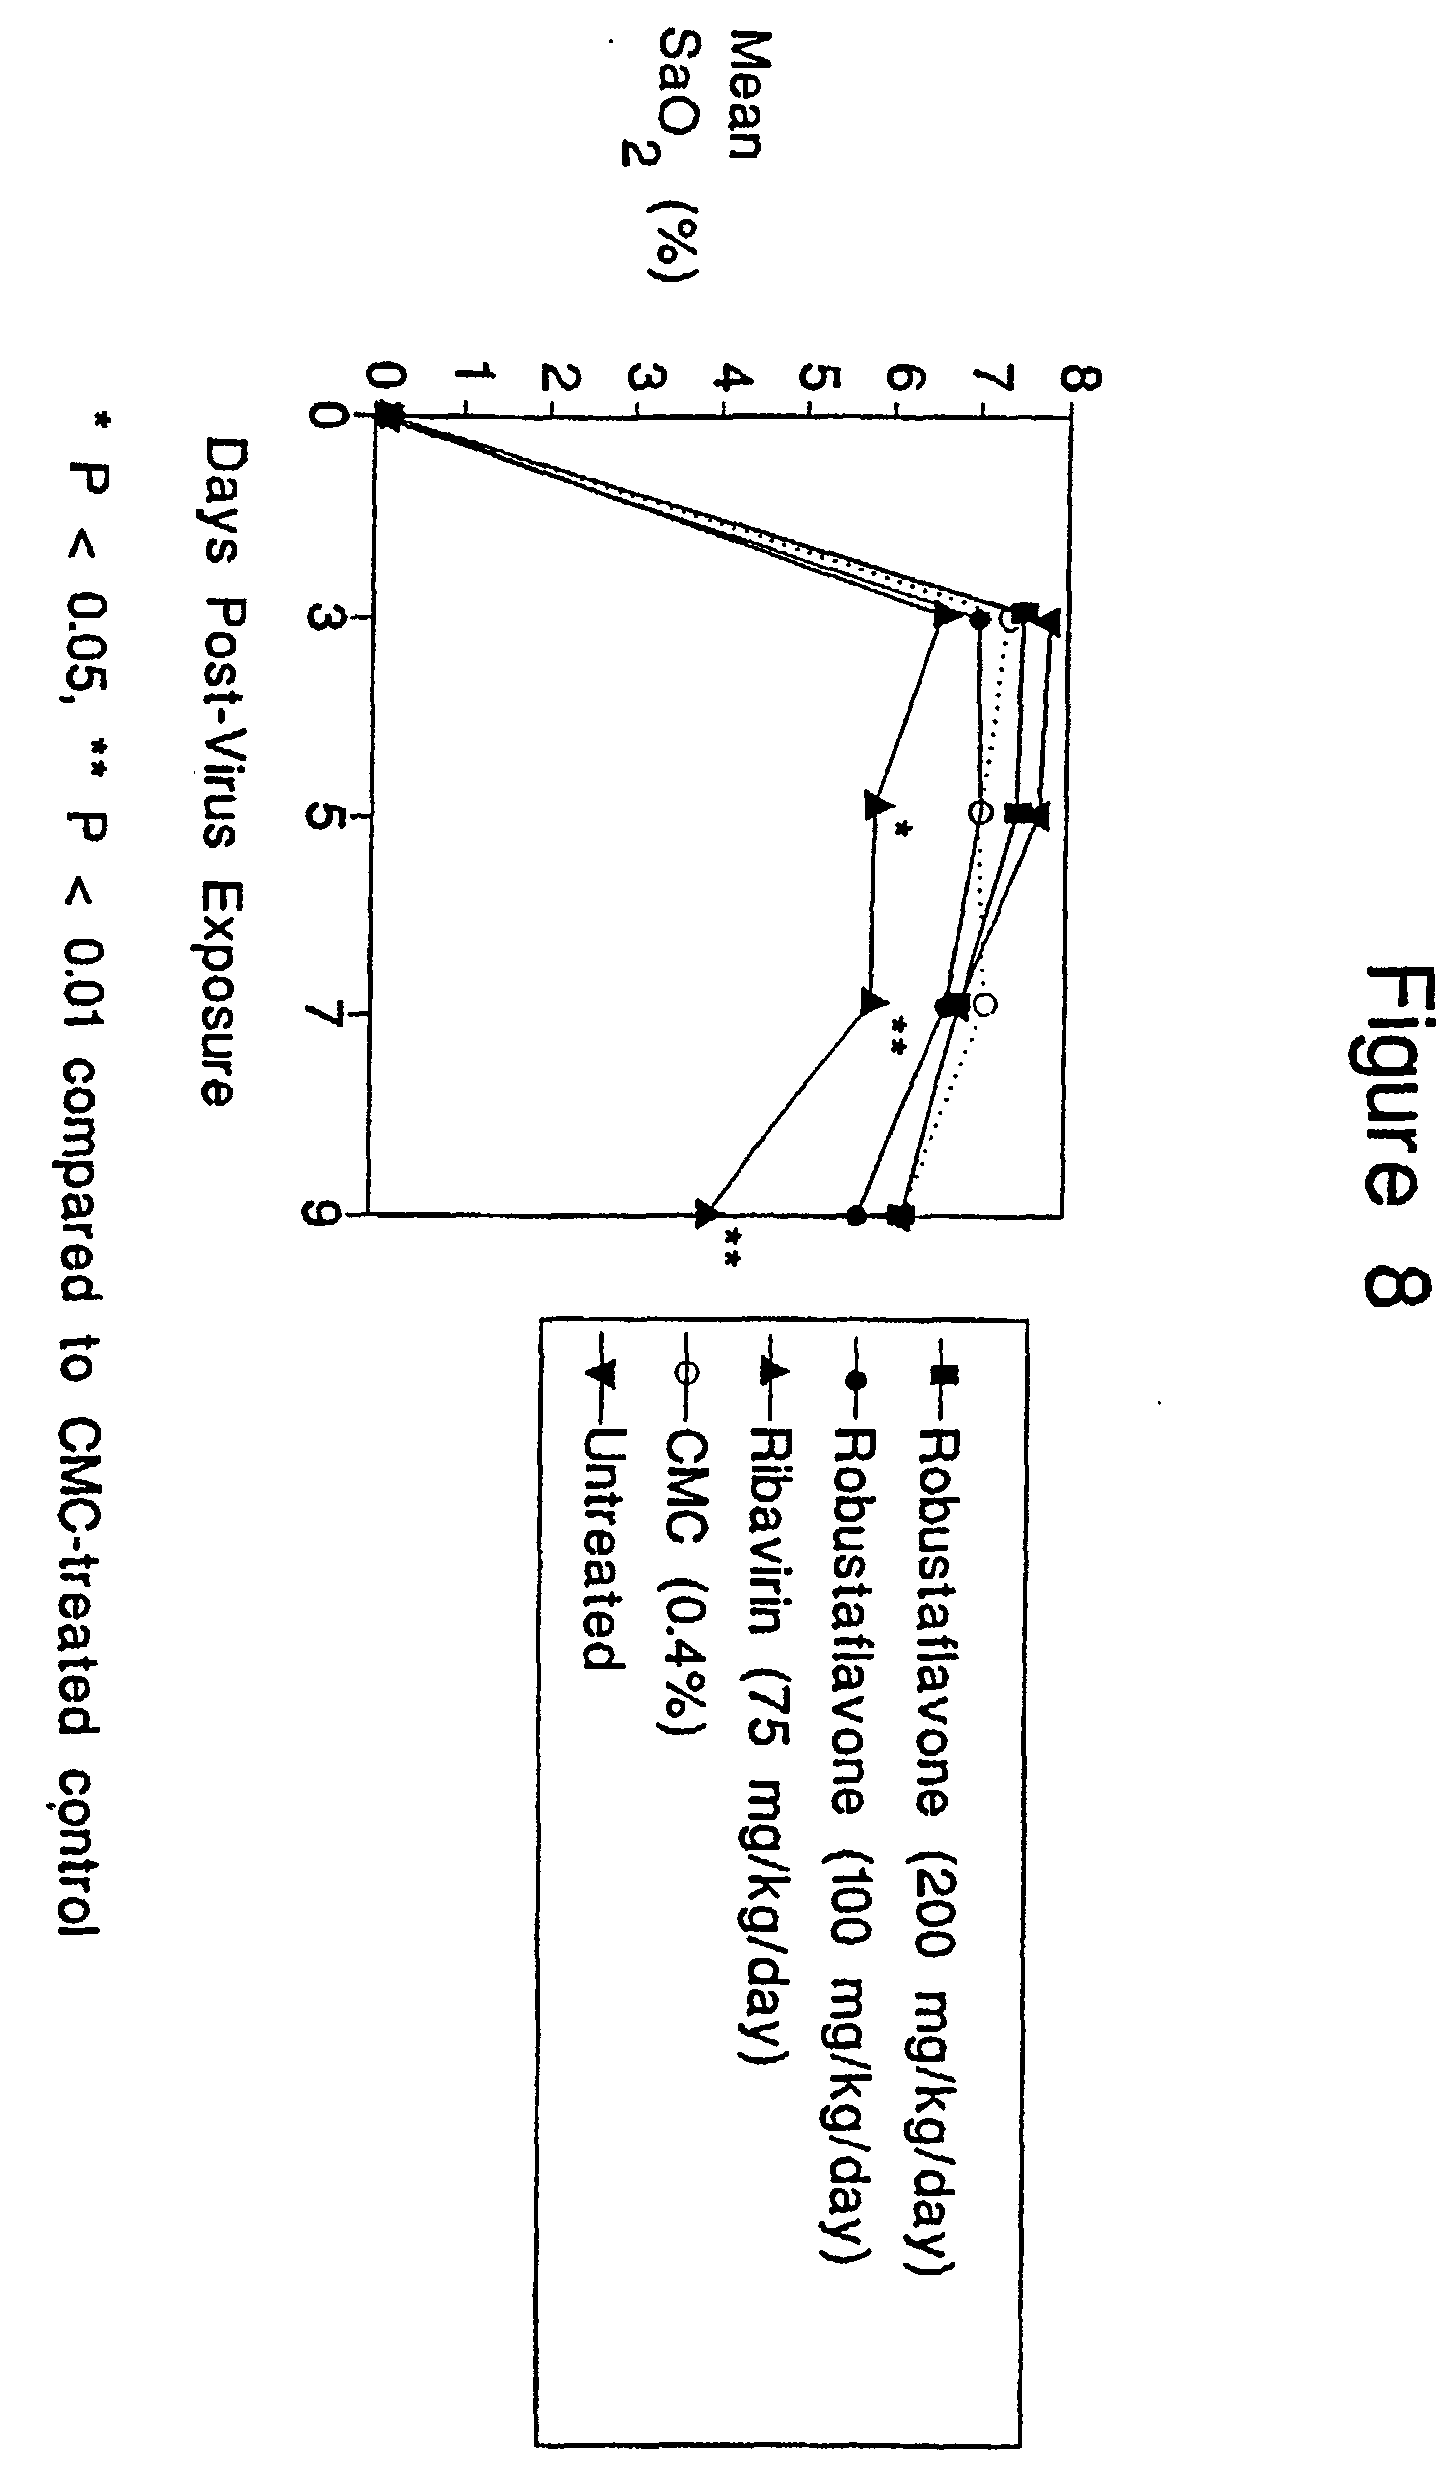 专利ep1245230a2 - amentoflavone